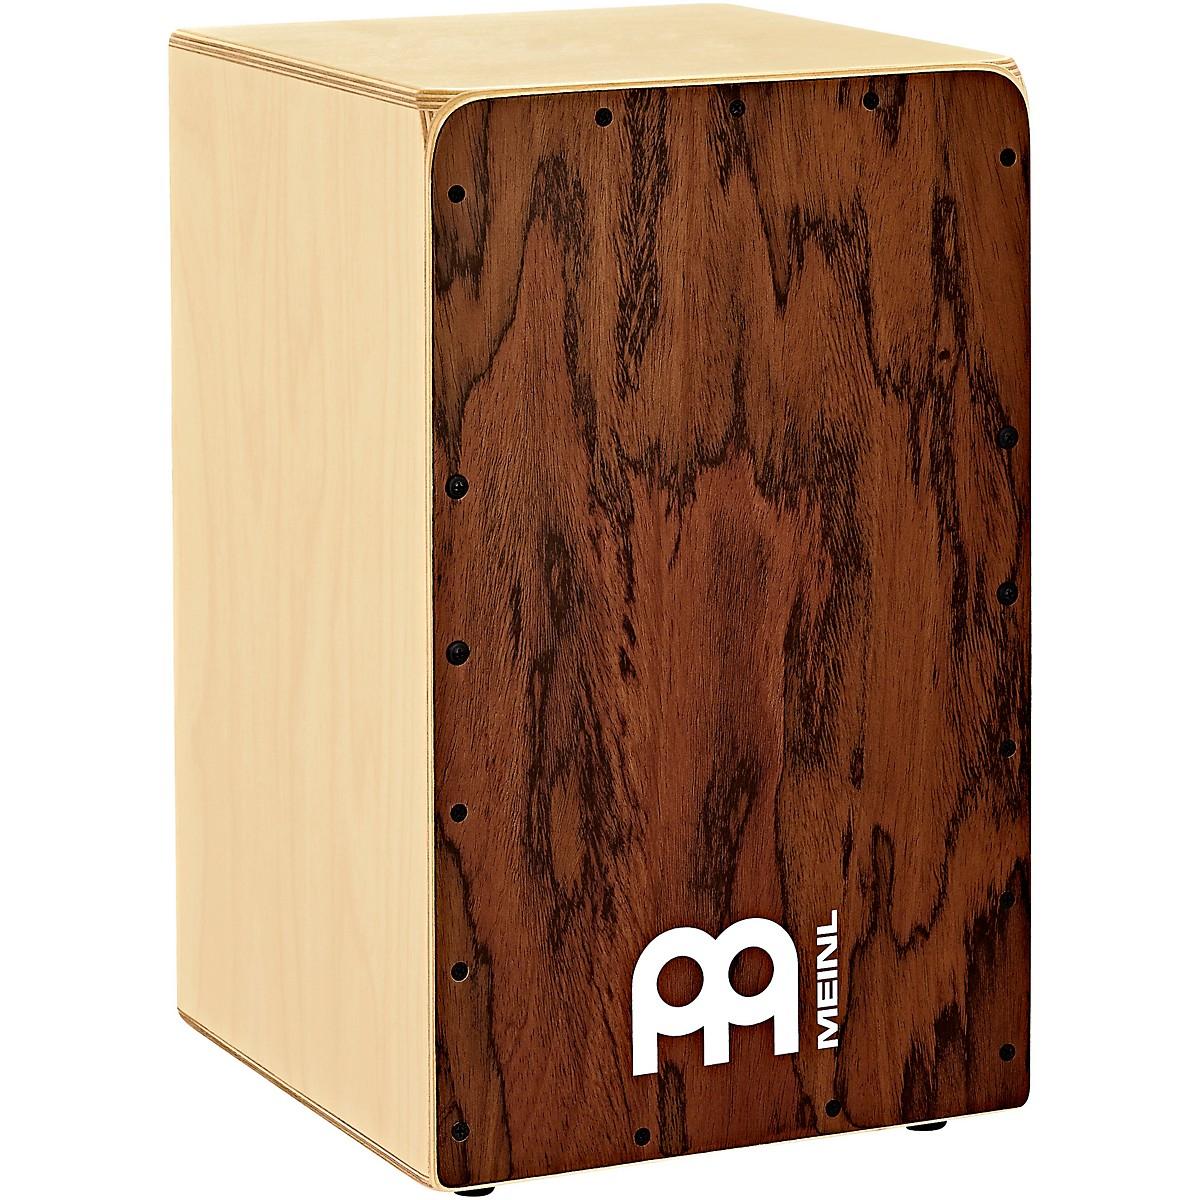 Meinl Snarecraft Series Cajon with Dark Eucalyptus Frontplate